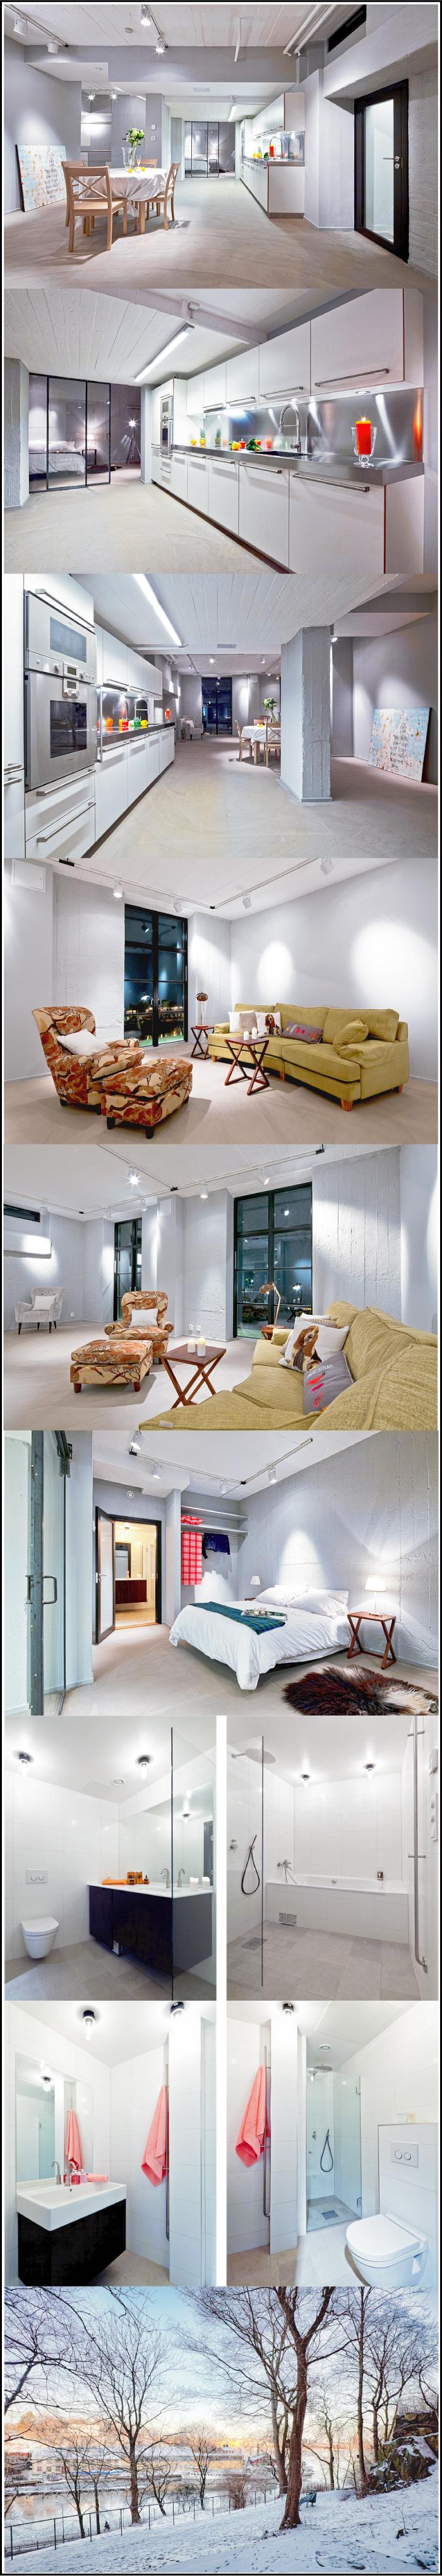 Loft suedois par for interieur chiara stella home for Interieur new yorkais